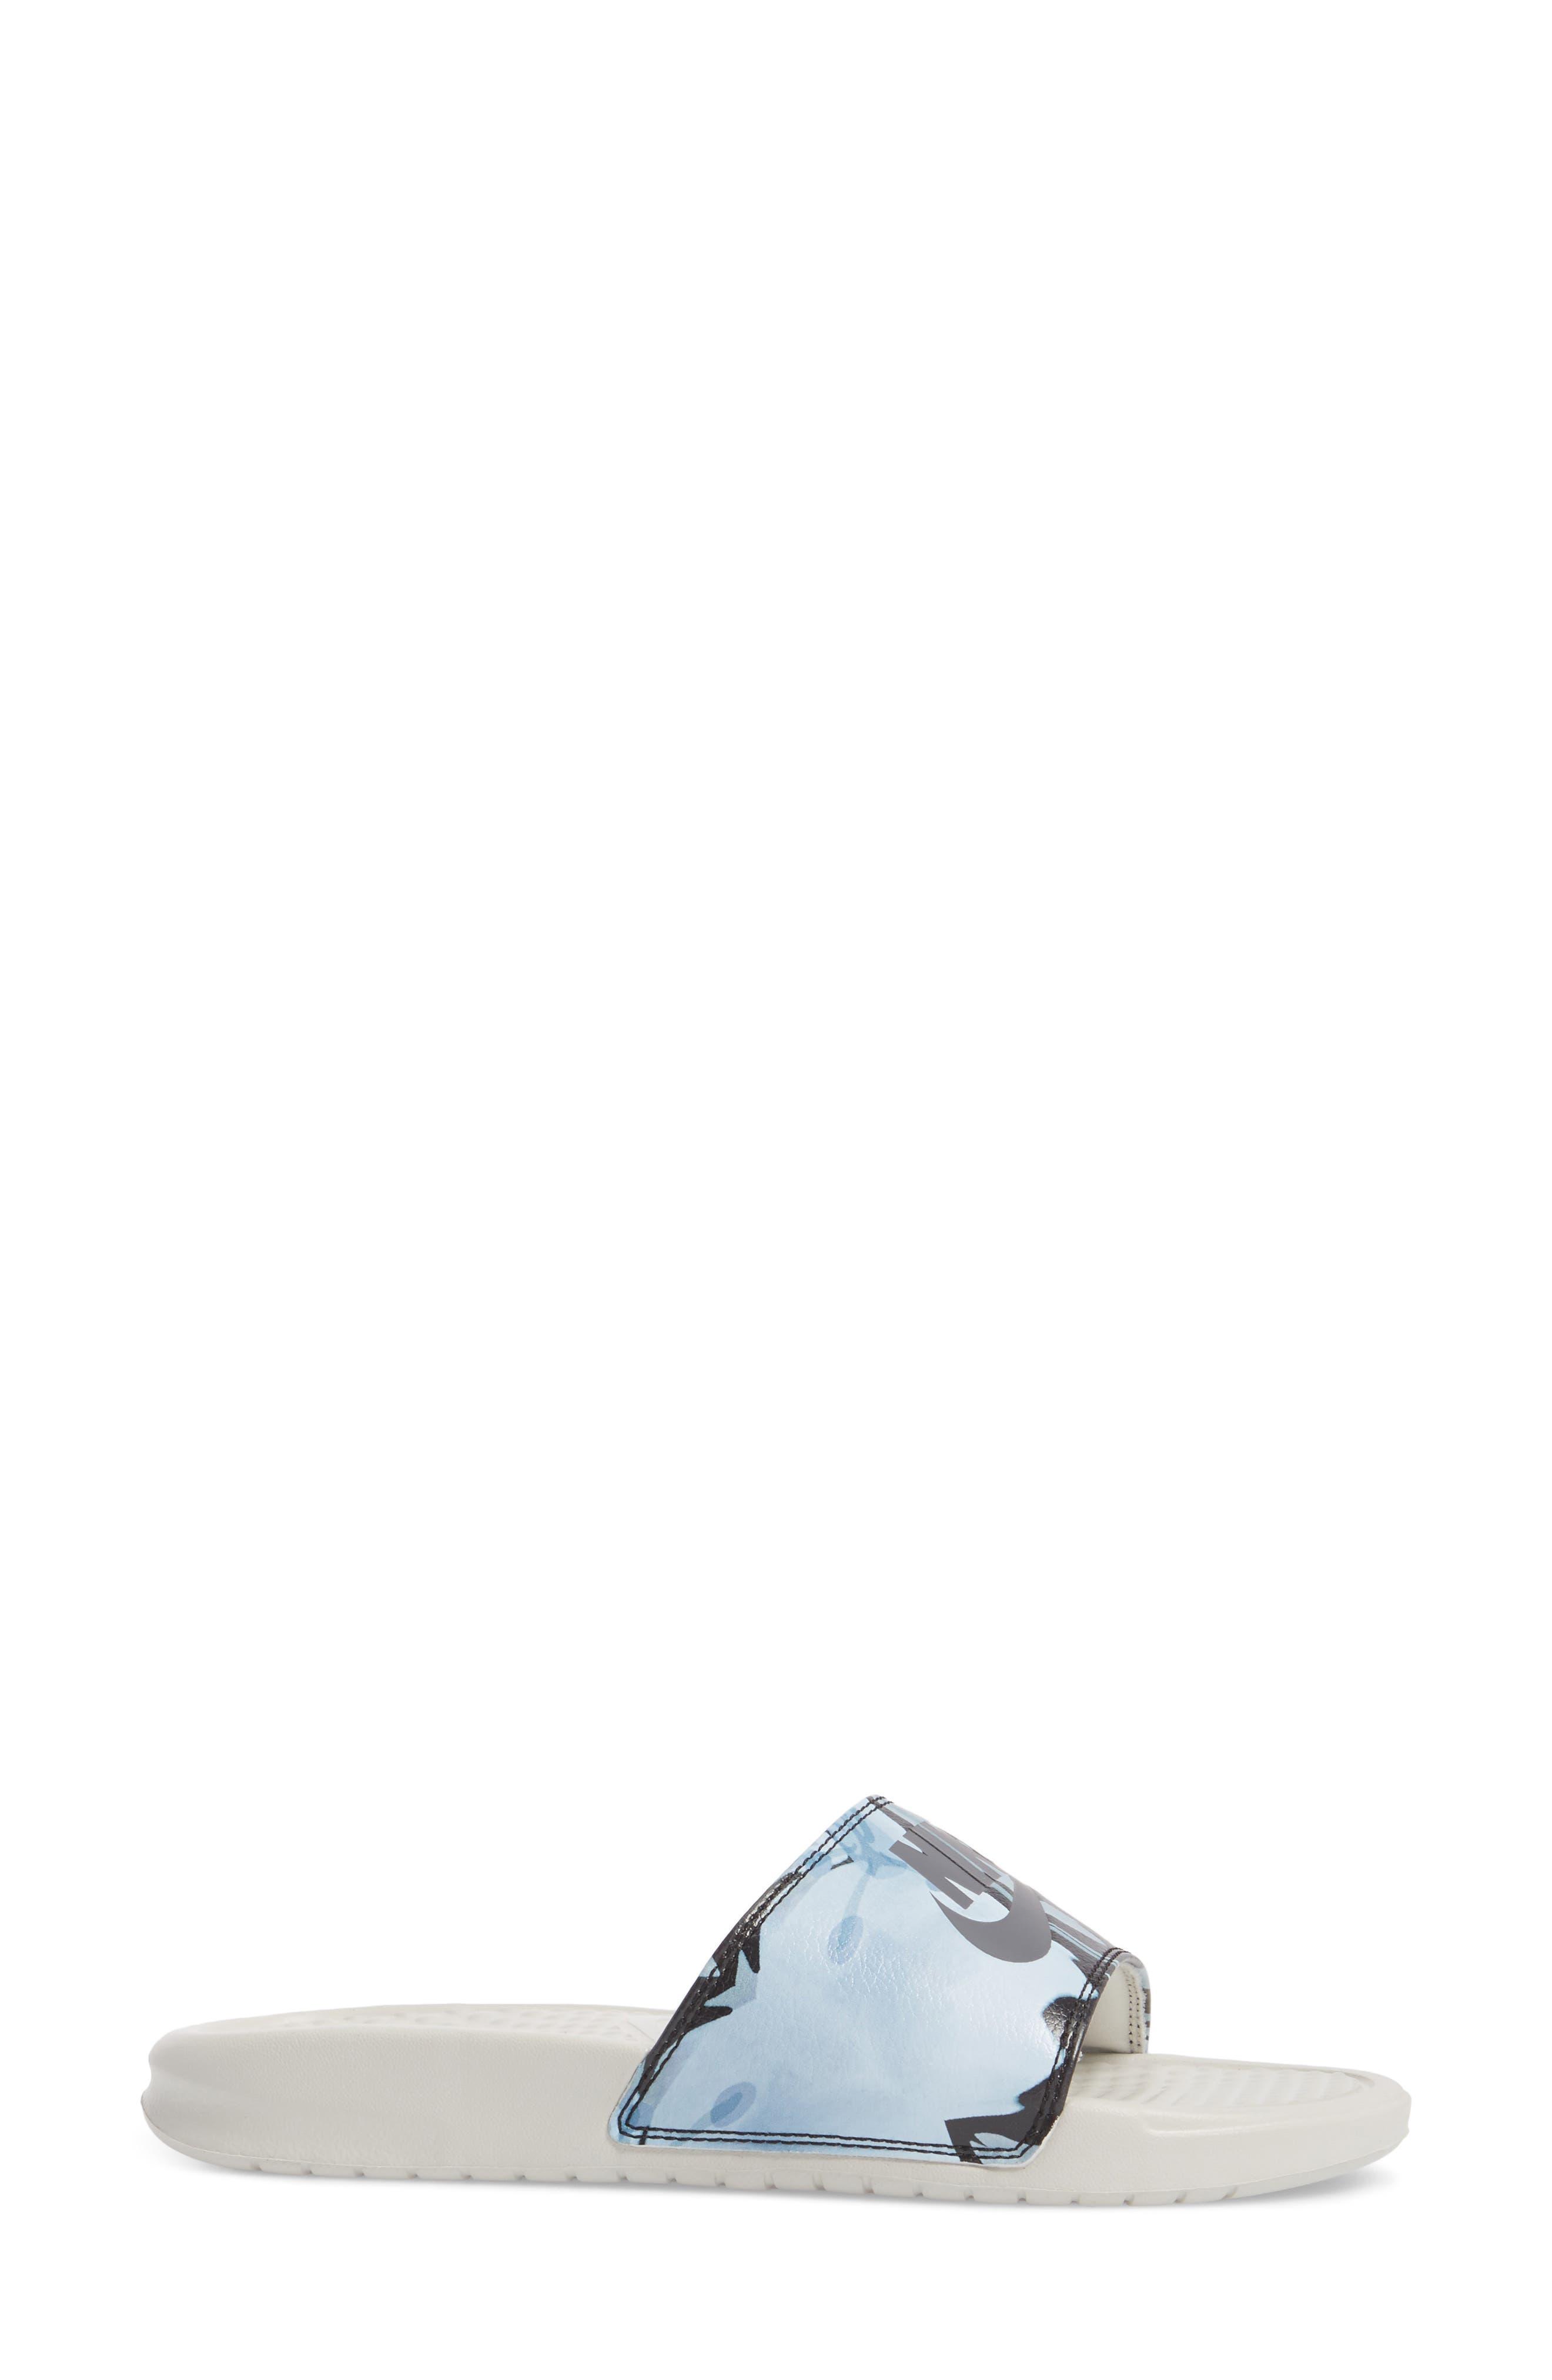 Alternate Image 3  - Nike 'Benassi - Just Do It' Print Sandal (Women)